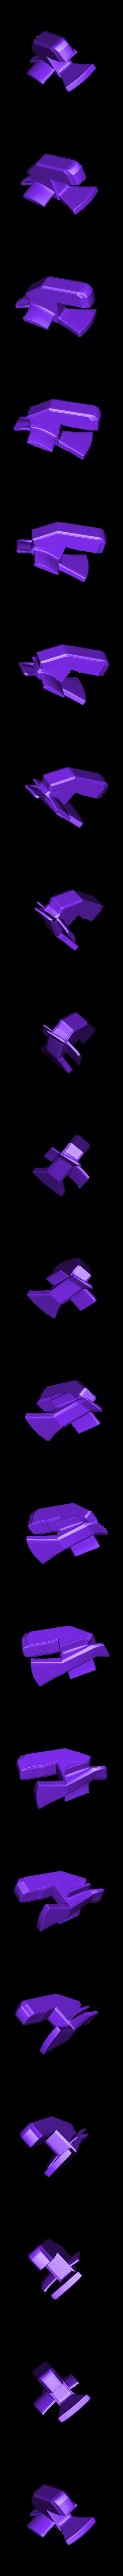 Lucio_tab_rgt.stl Download free STL file Overwatch Lucio Blaster • 3D printer object, Adafruit